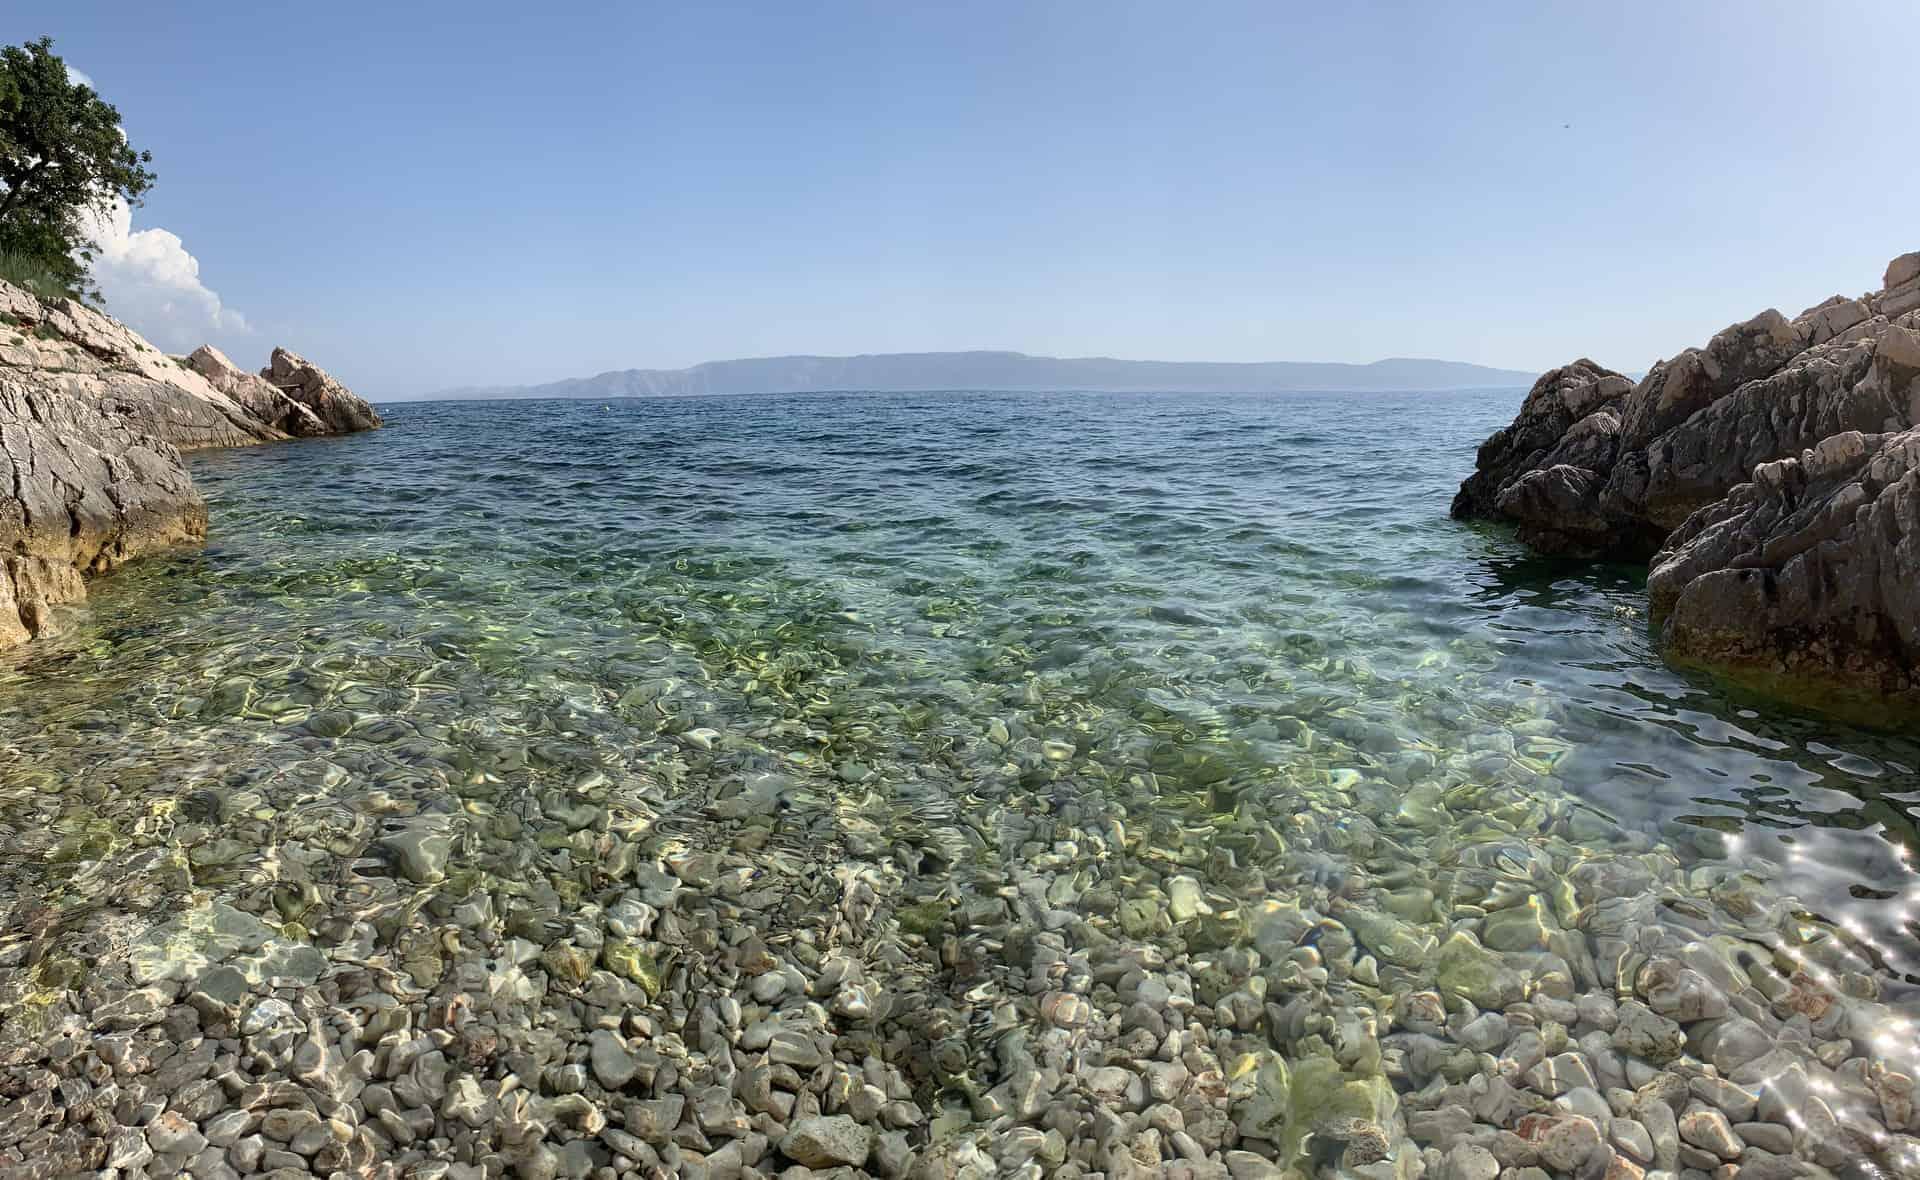 Autokamp_Povile_Blick_aufs_Meer